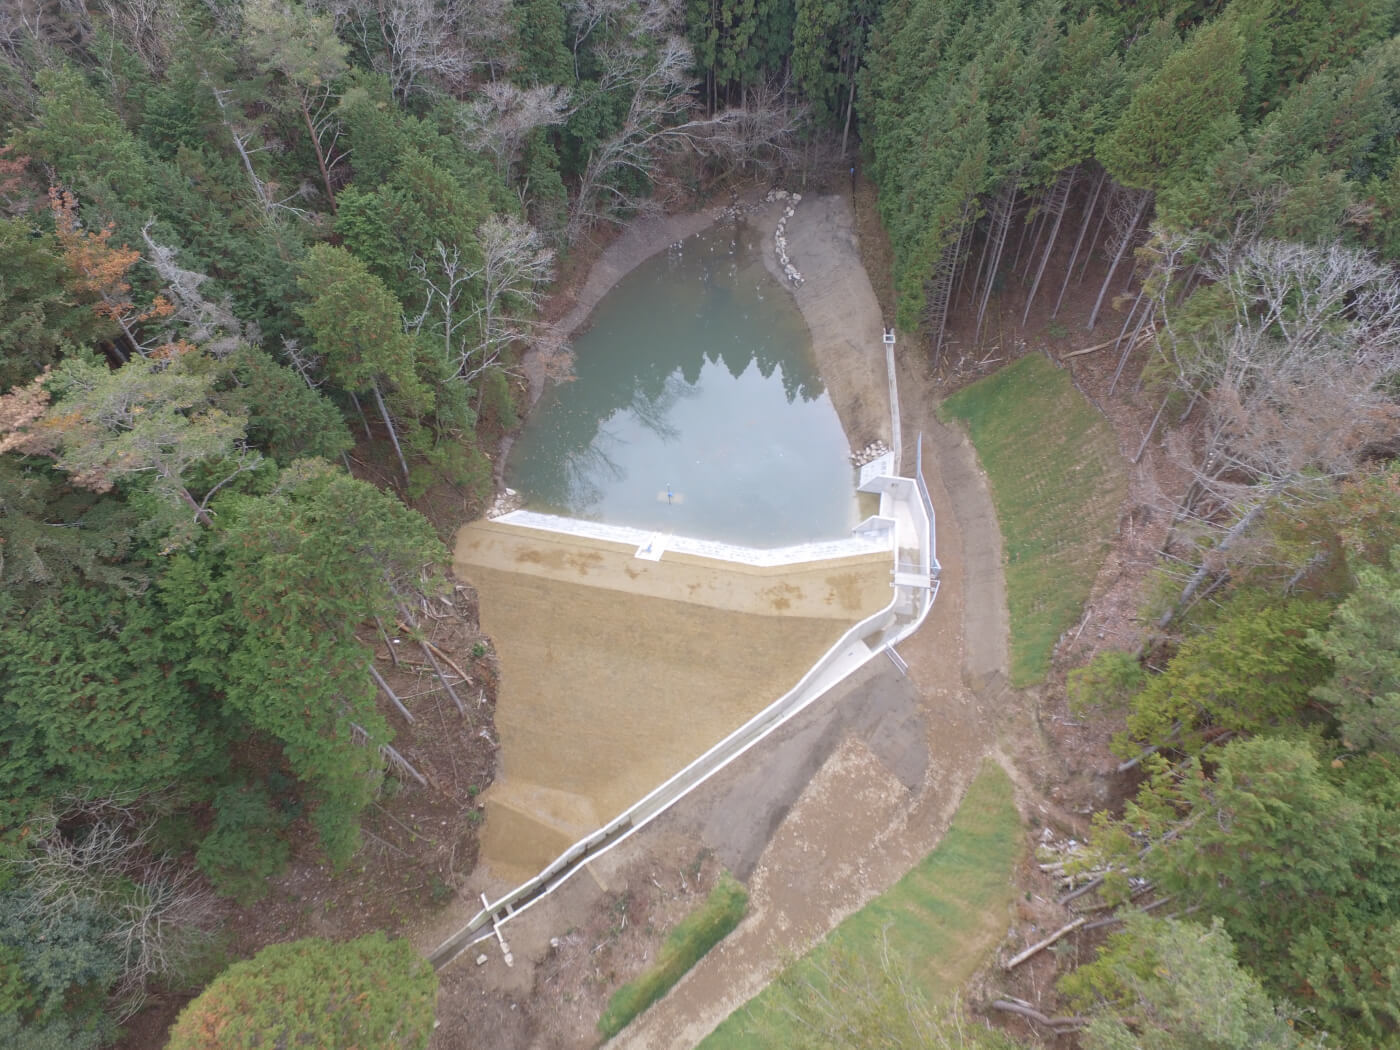 県営ため池等整備事業 御屋敷池改修工事